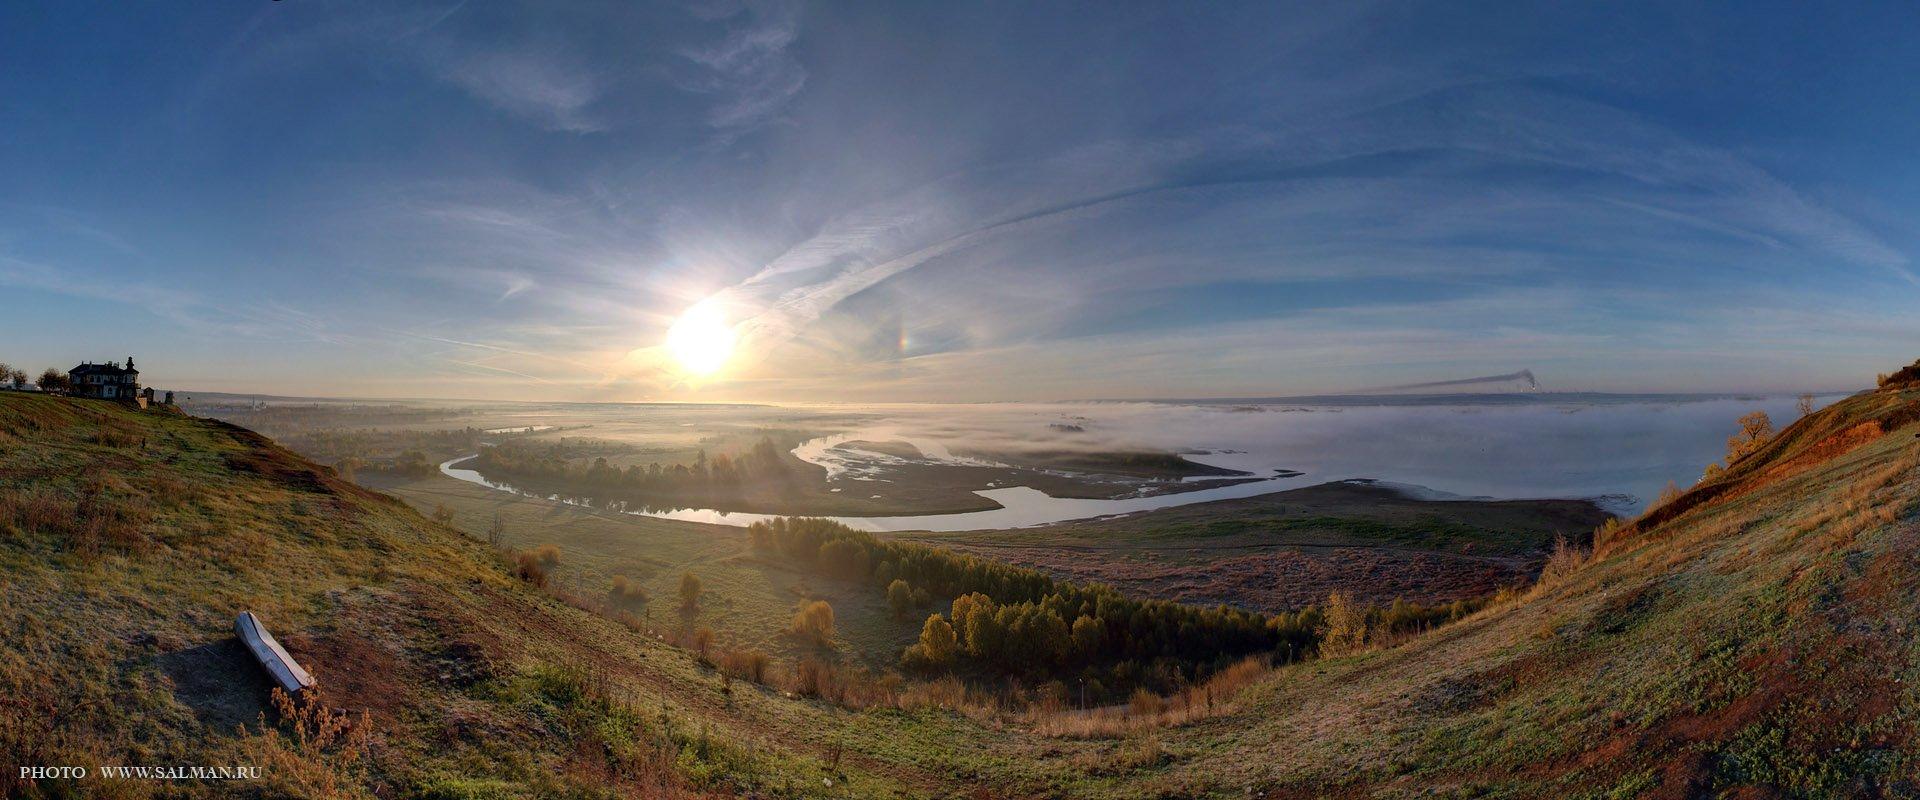 елабуга,осень,река,туман,кама,тойма,чертово городище,, salman